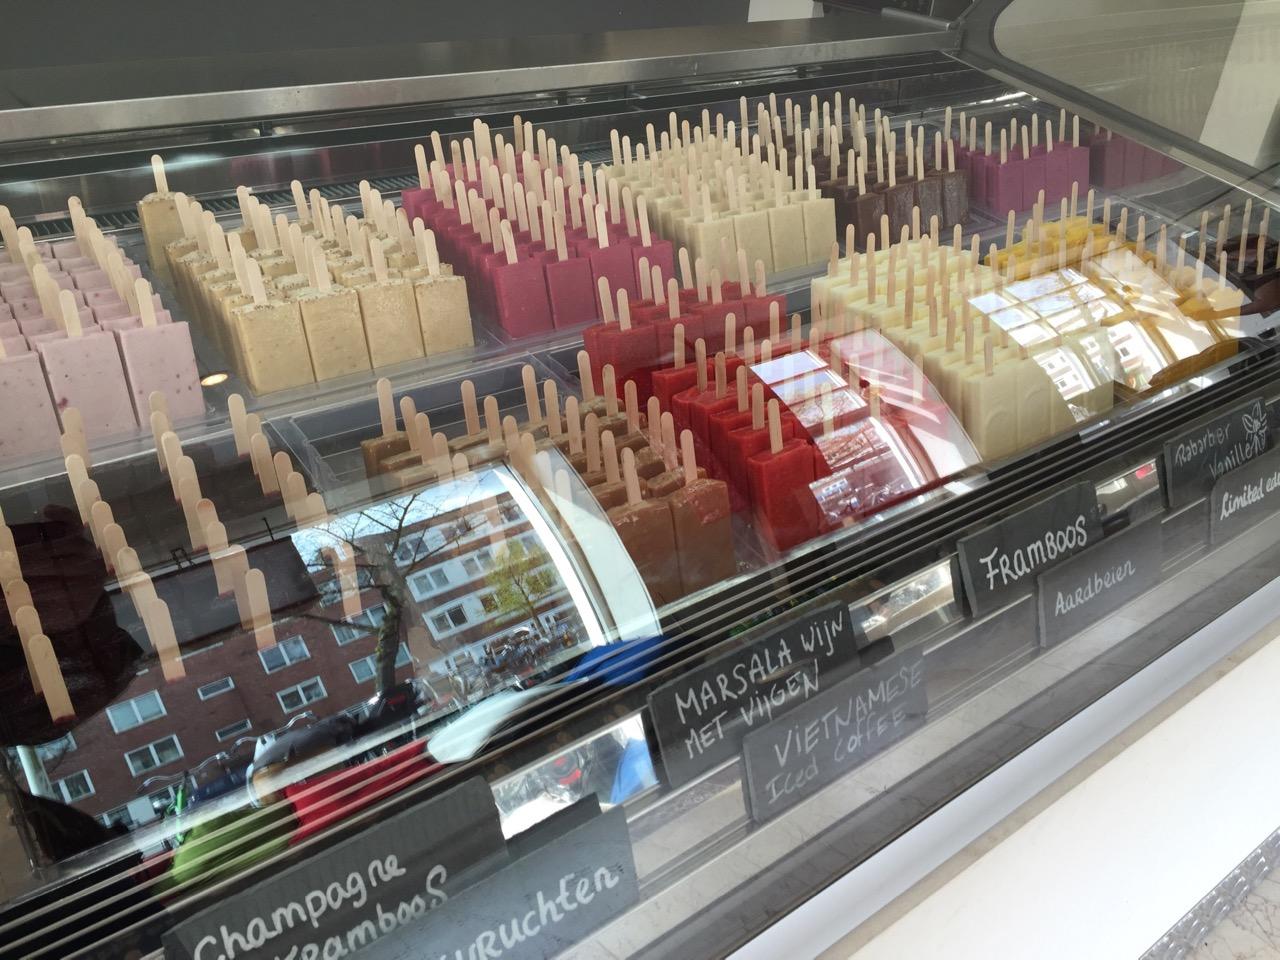 IJmanschap Popsicles / Amsterdam / iPhone 6